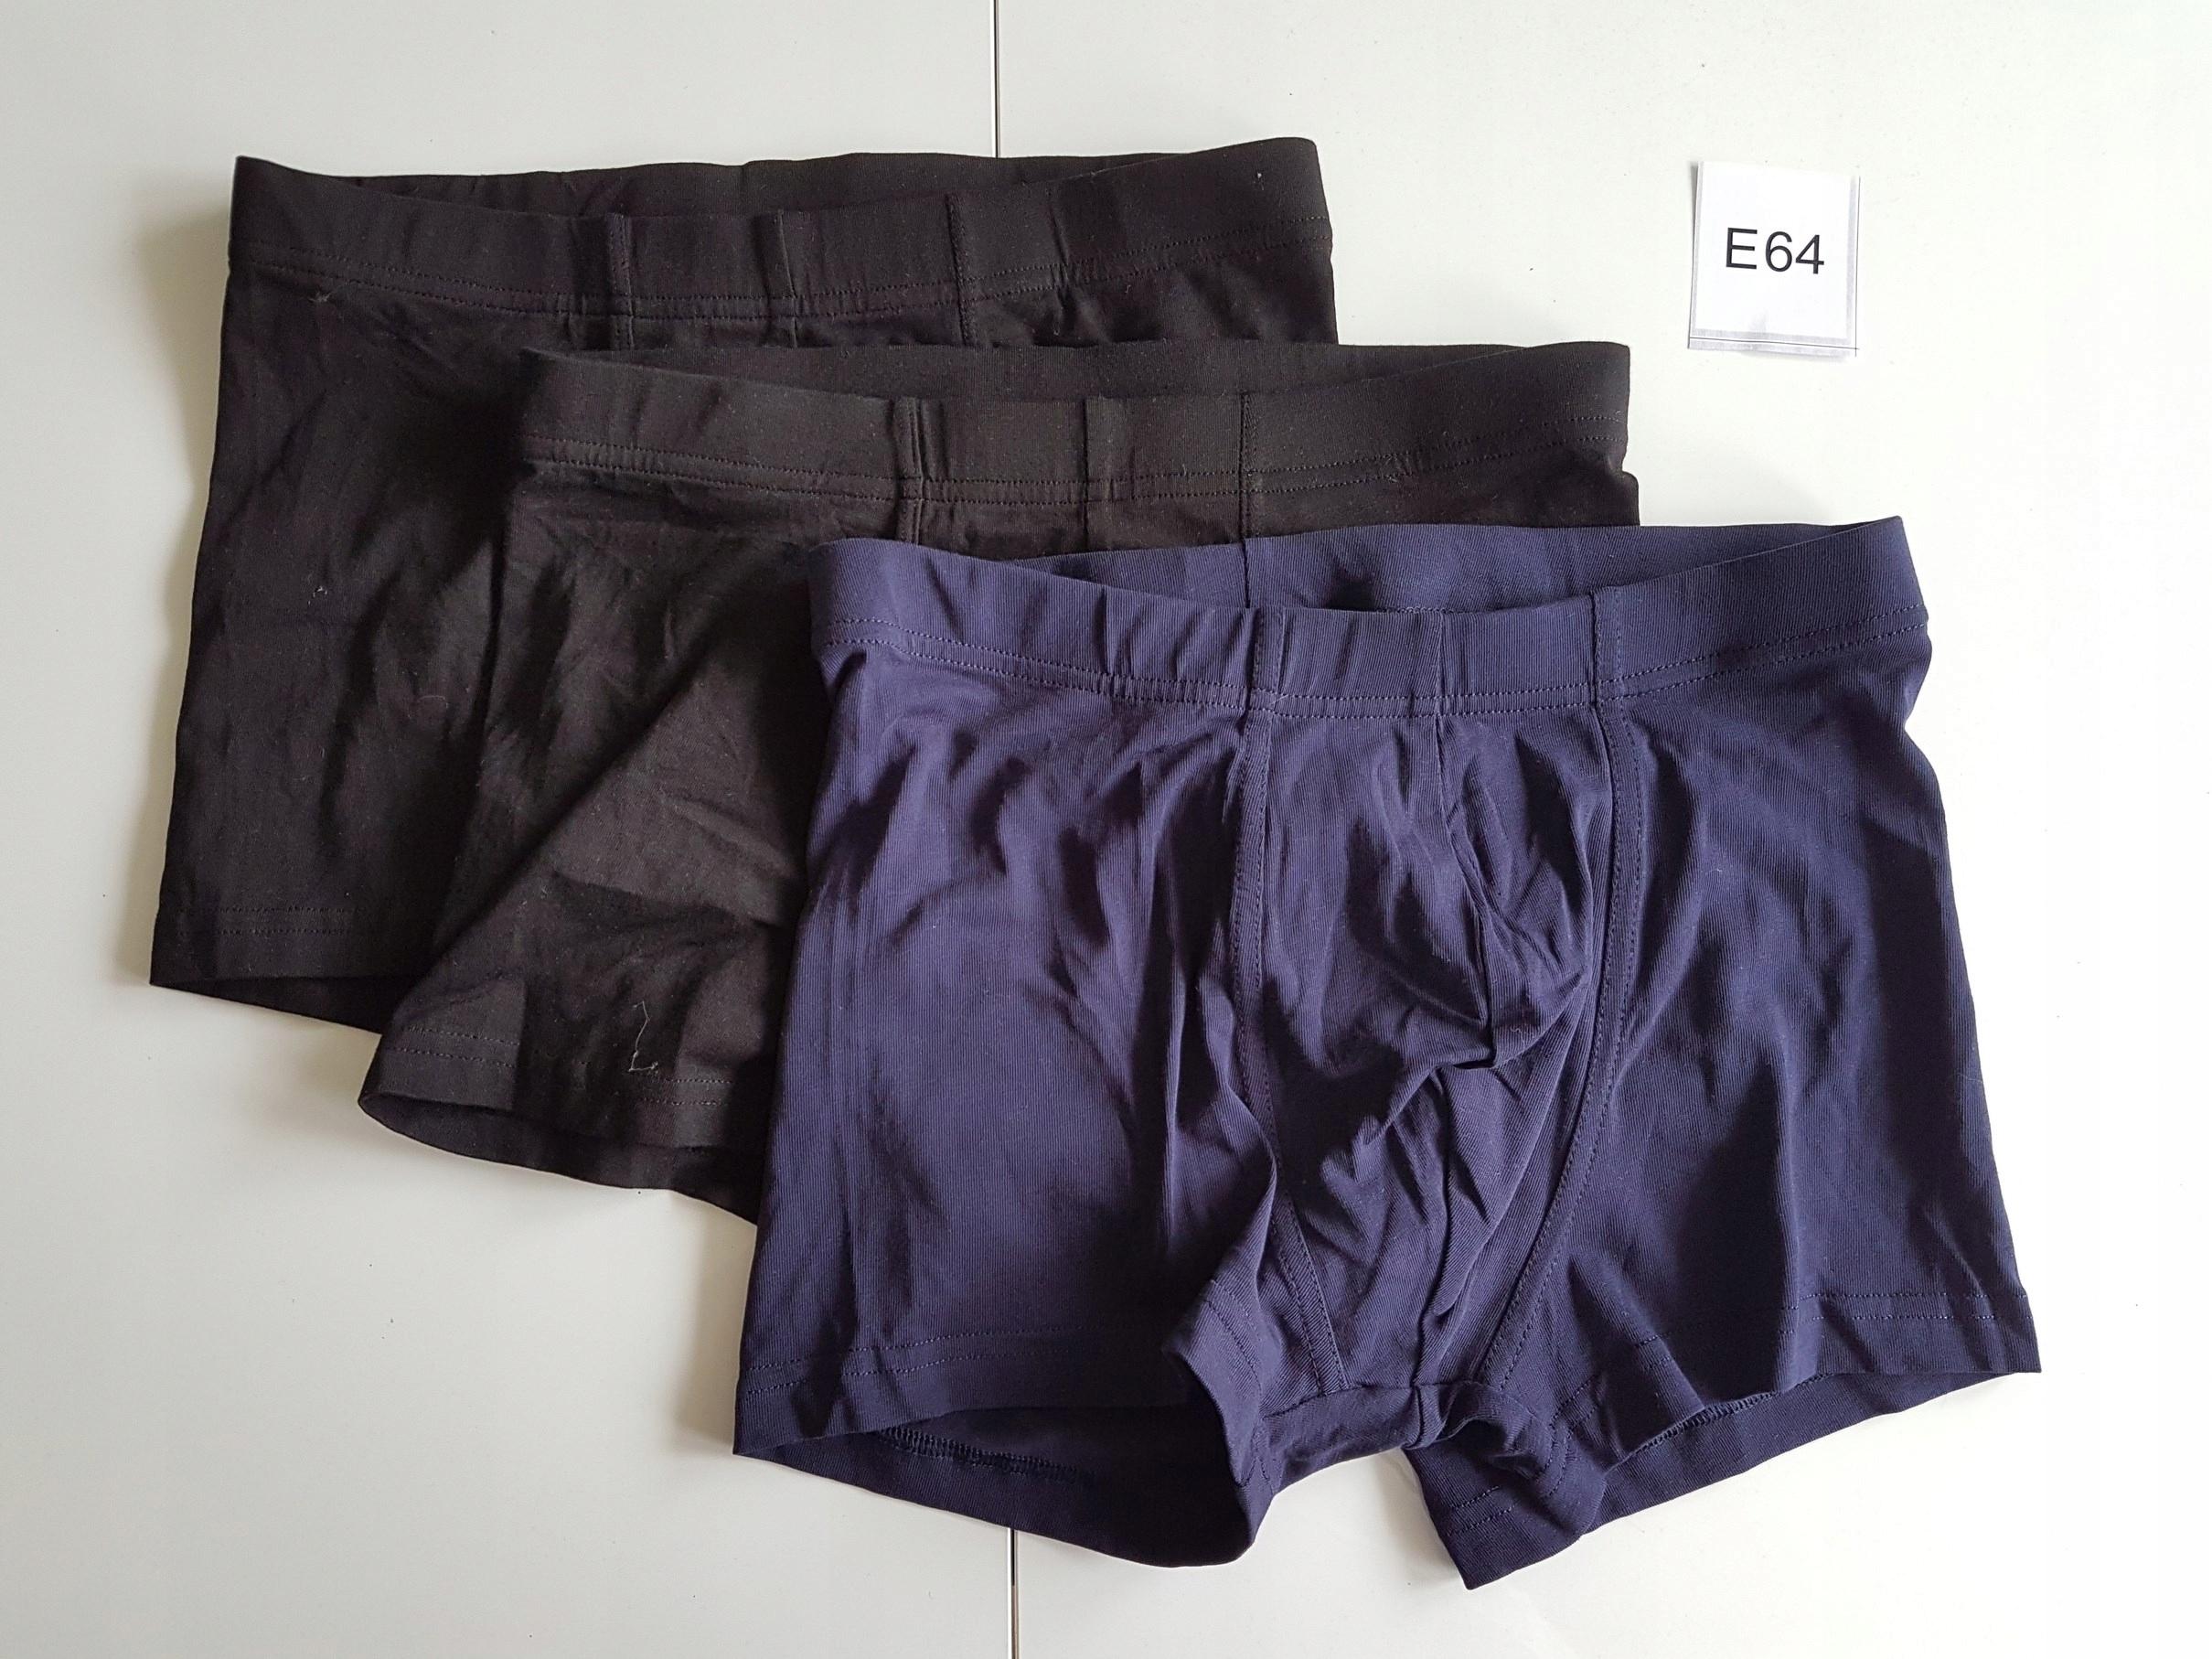 BOKSERKI majtki H&M rozm: S 3-pak E64